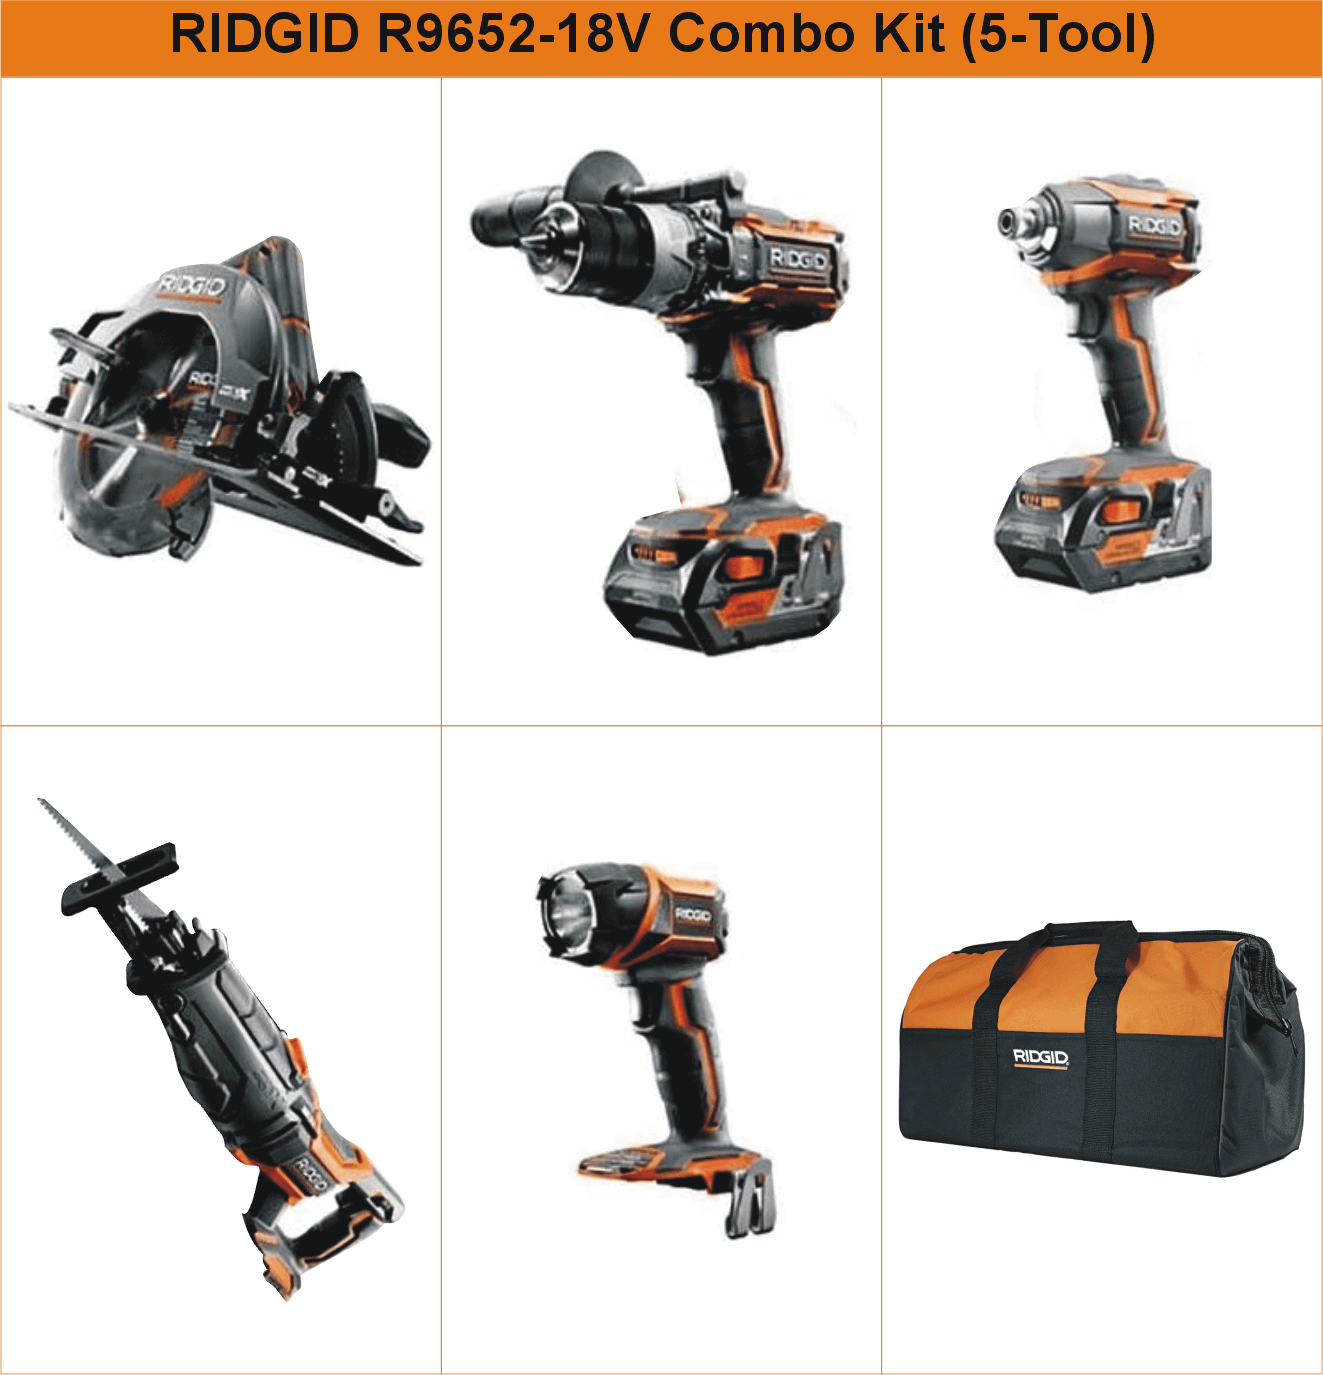 ridgid-r9652-18v-tool-5-pieces-combo-kit